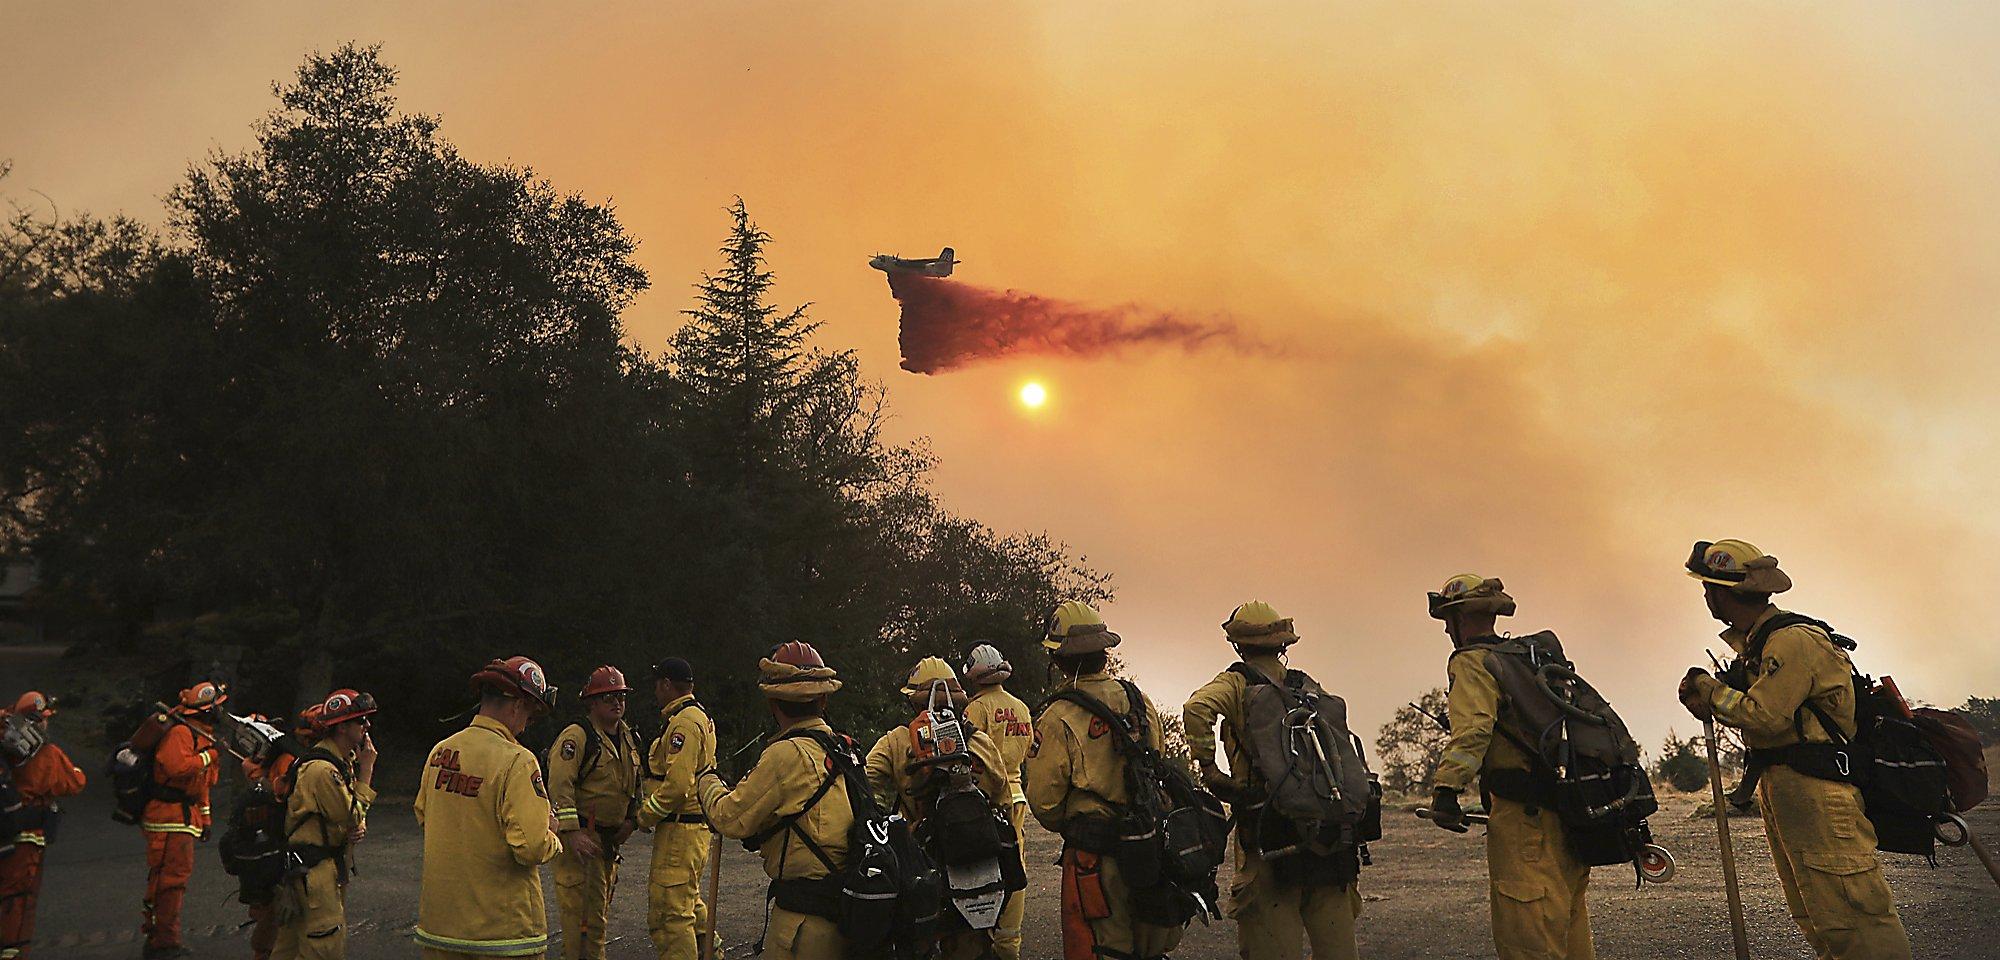 Watch a 747 'SuperTanker' drop retardant on wildfires in Geyserville -  SFGate